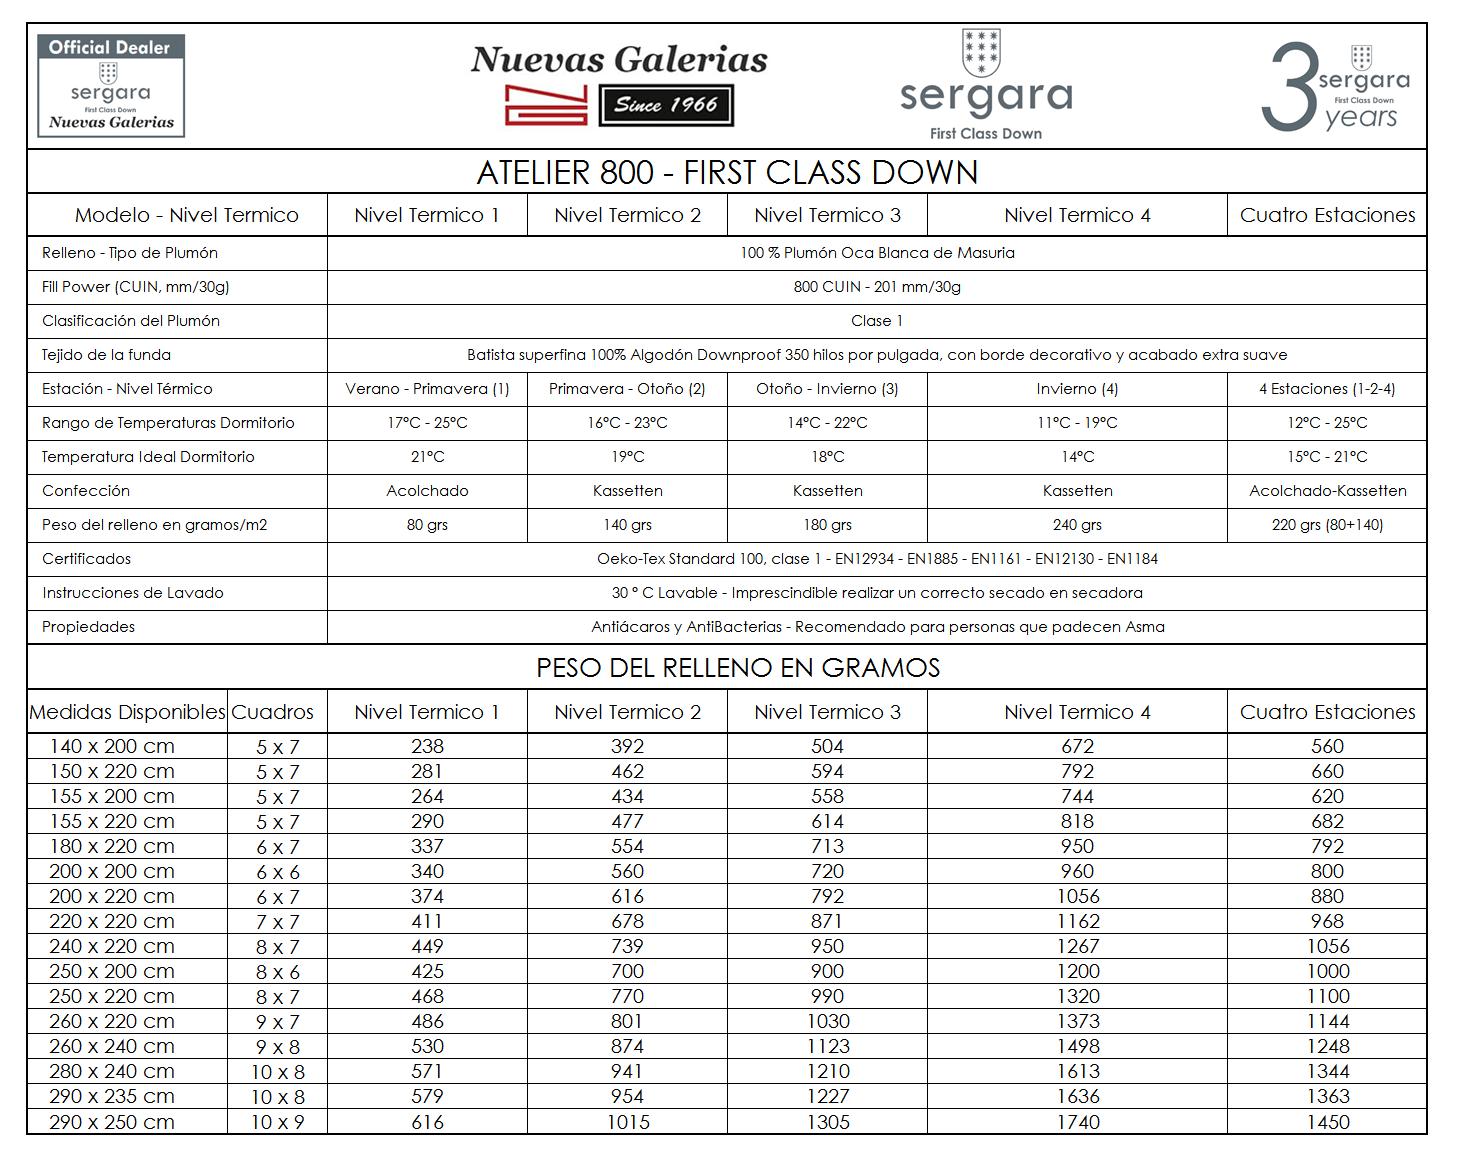 Caracteristicas Norico Sergara Atelier 800 First Class Down